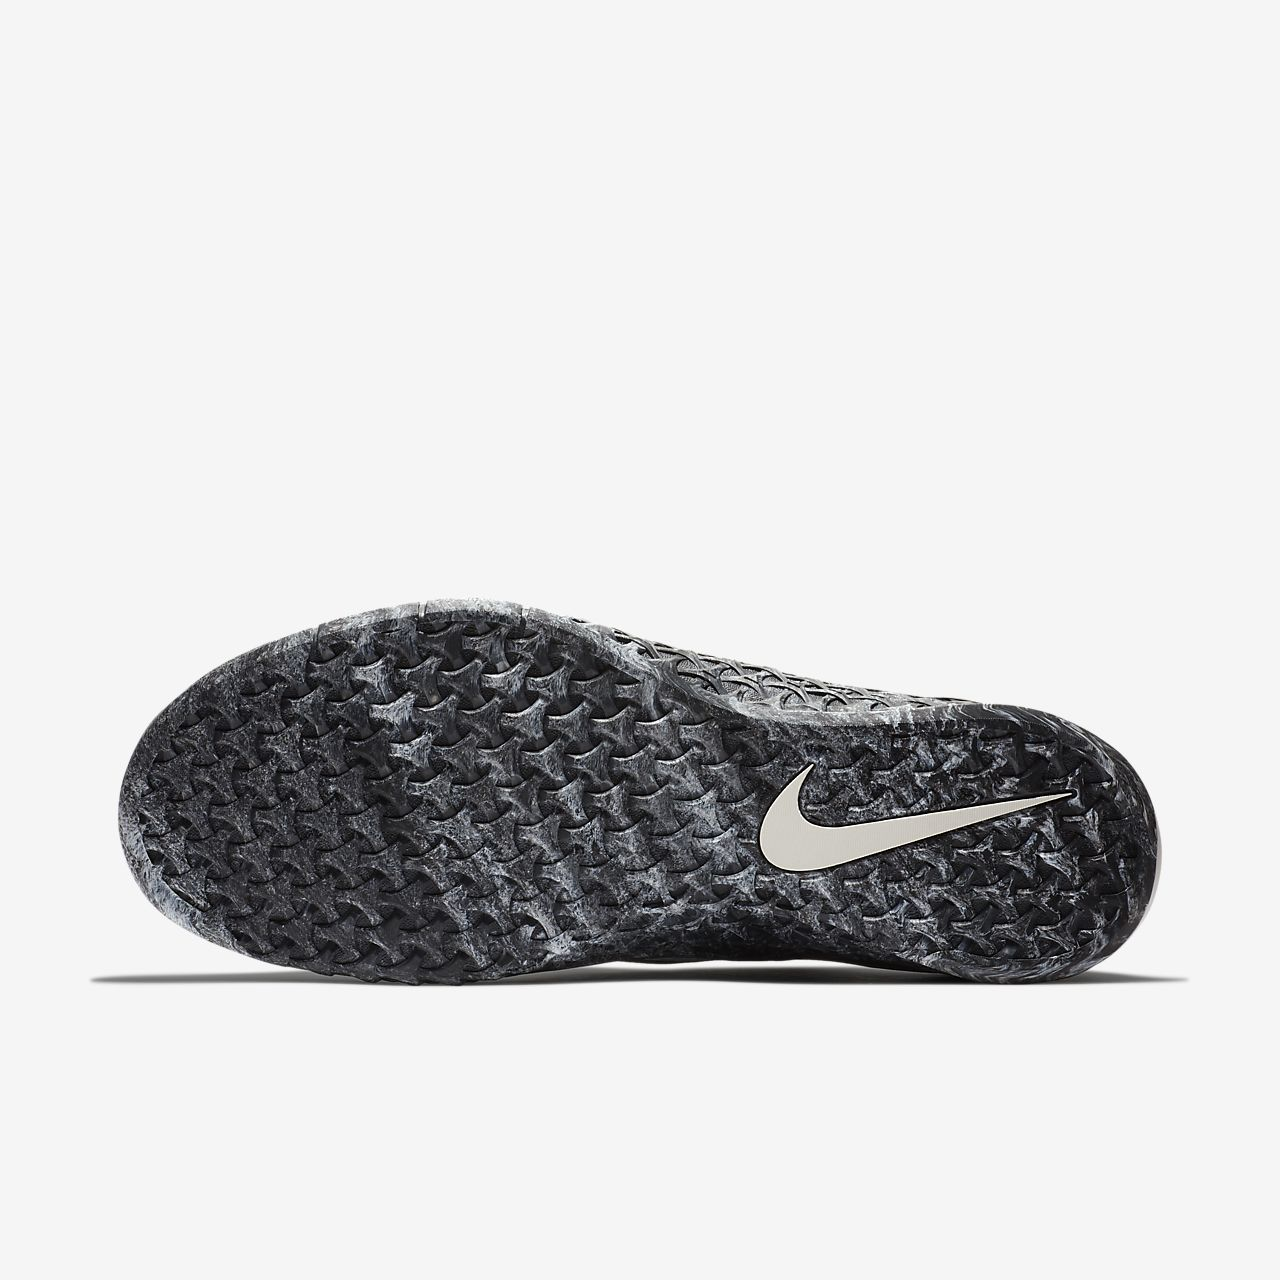 size 40 b4231 43064 ... Nike Metcon 4 Men s Cross Training Weightlifting Shoe